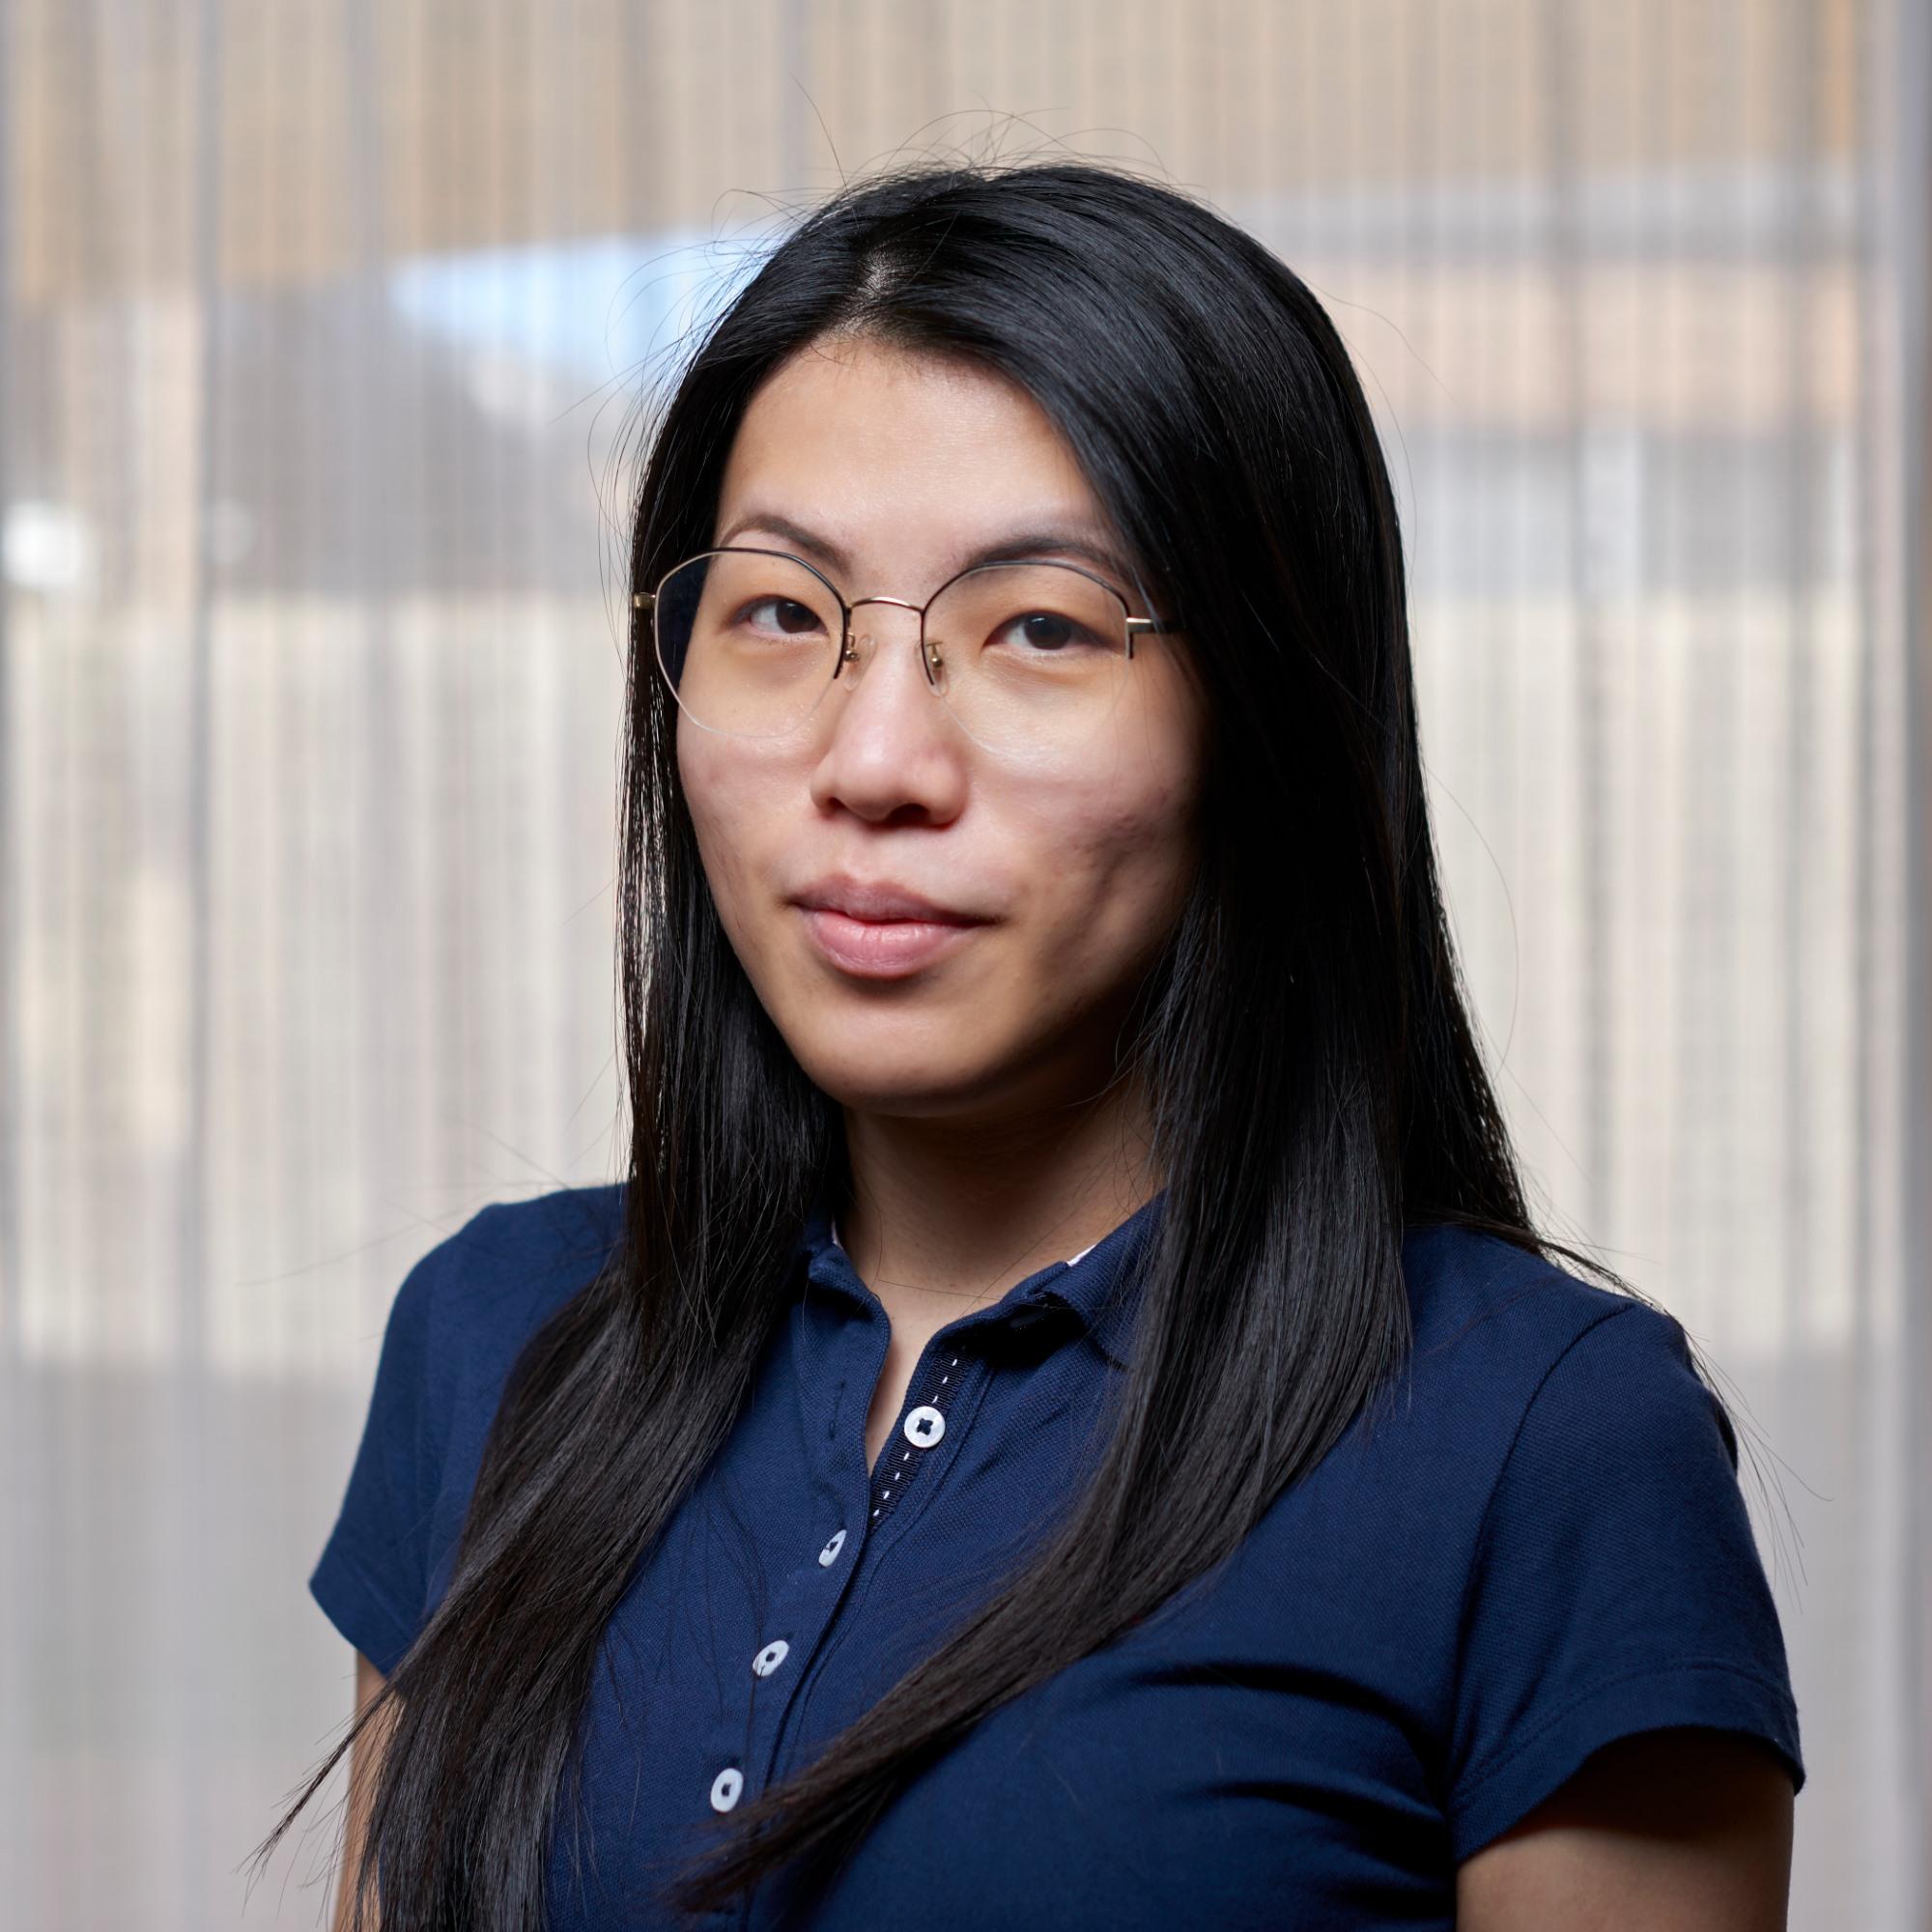 Cindy Hsin Yee Tee